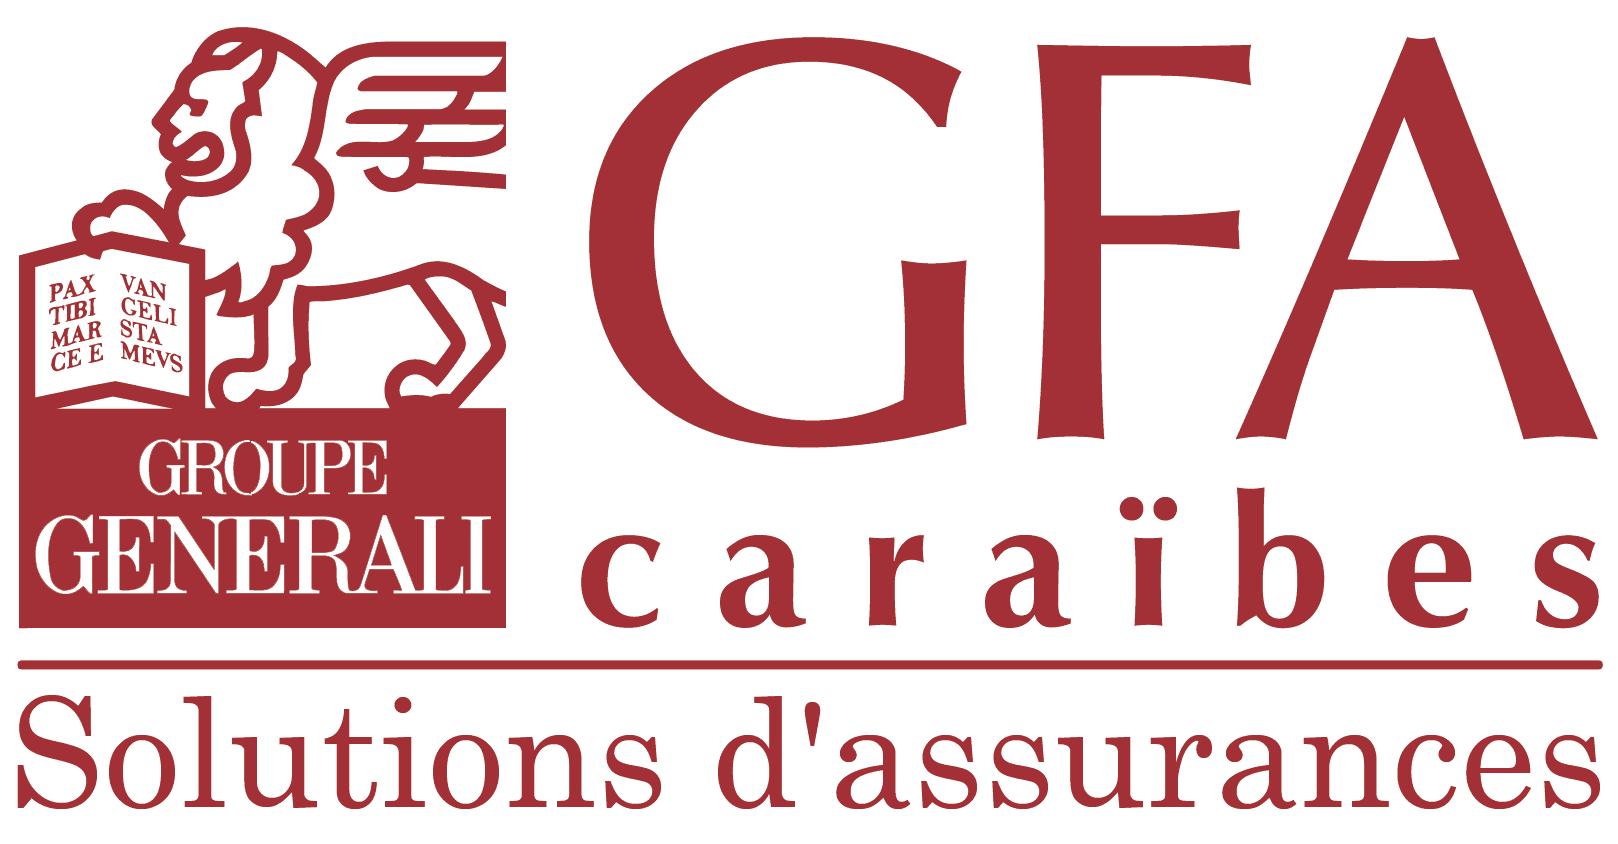 Logo GFA Caraïbes GROUPE GENERALI Solutions d'assurances